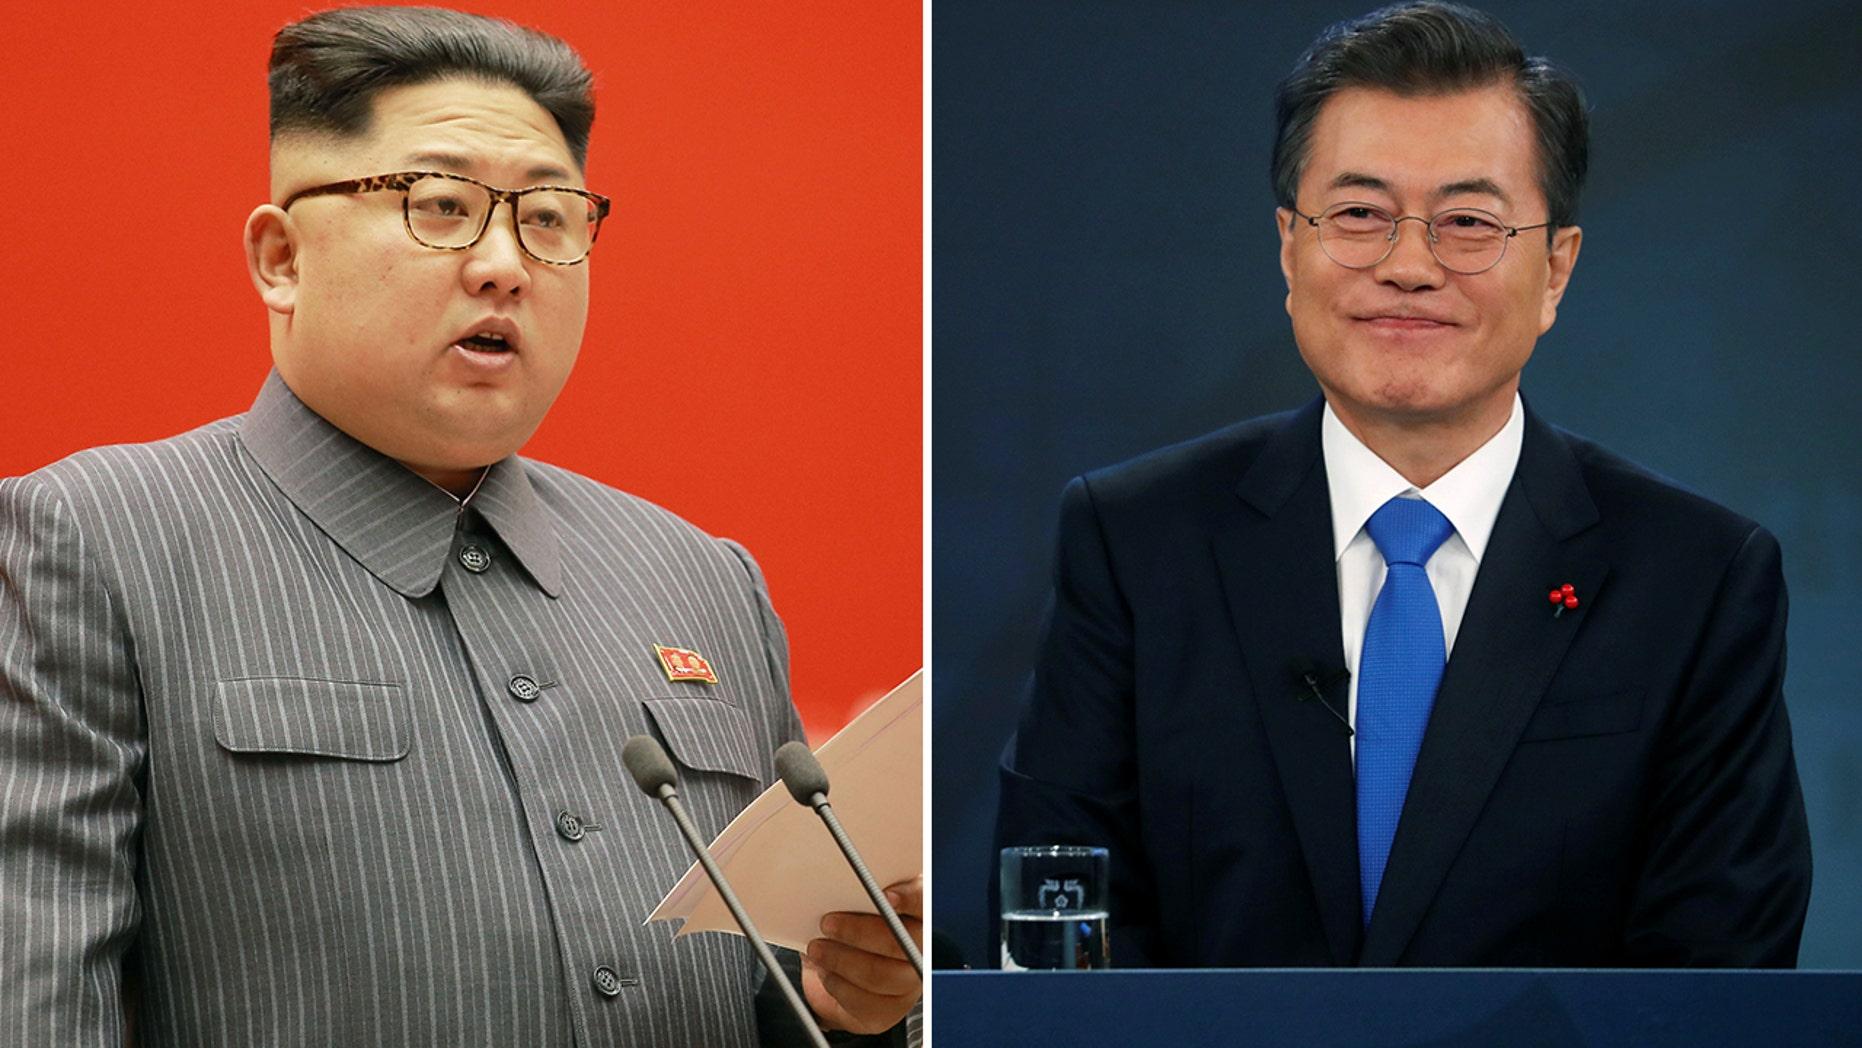 North Korean leader Kim Jong Un on Saturday invited South Korean President Moon Jae-in to the North.